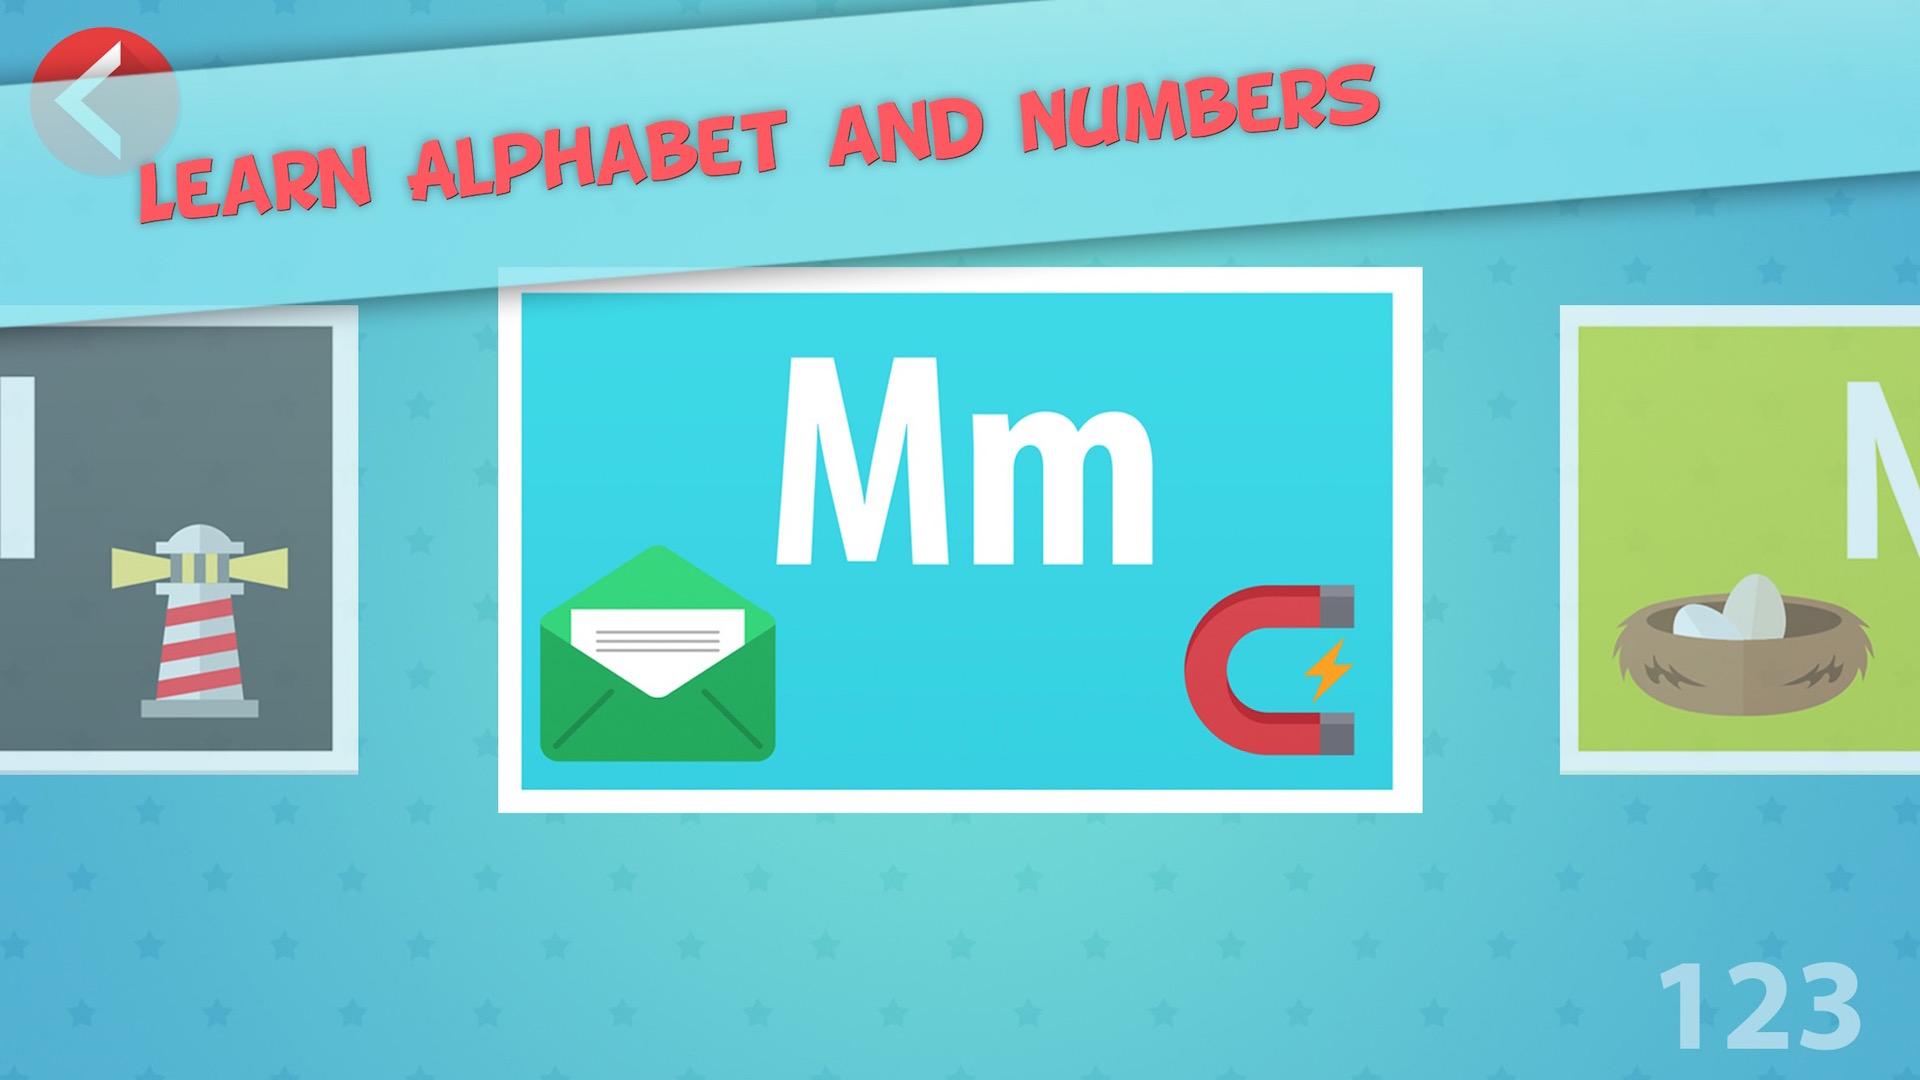 Amazon.com: Alphabet Preschool - Free Kindle Fire Edition: Appstore ...